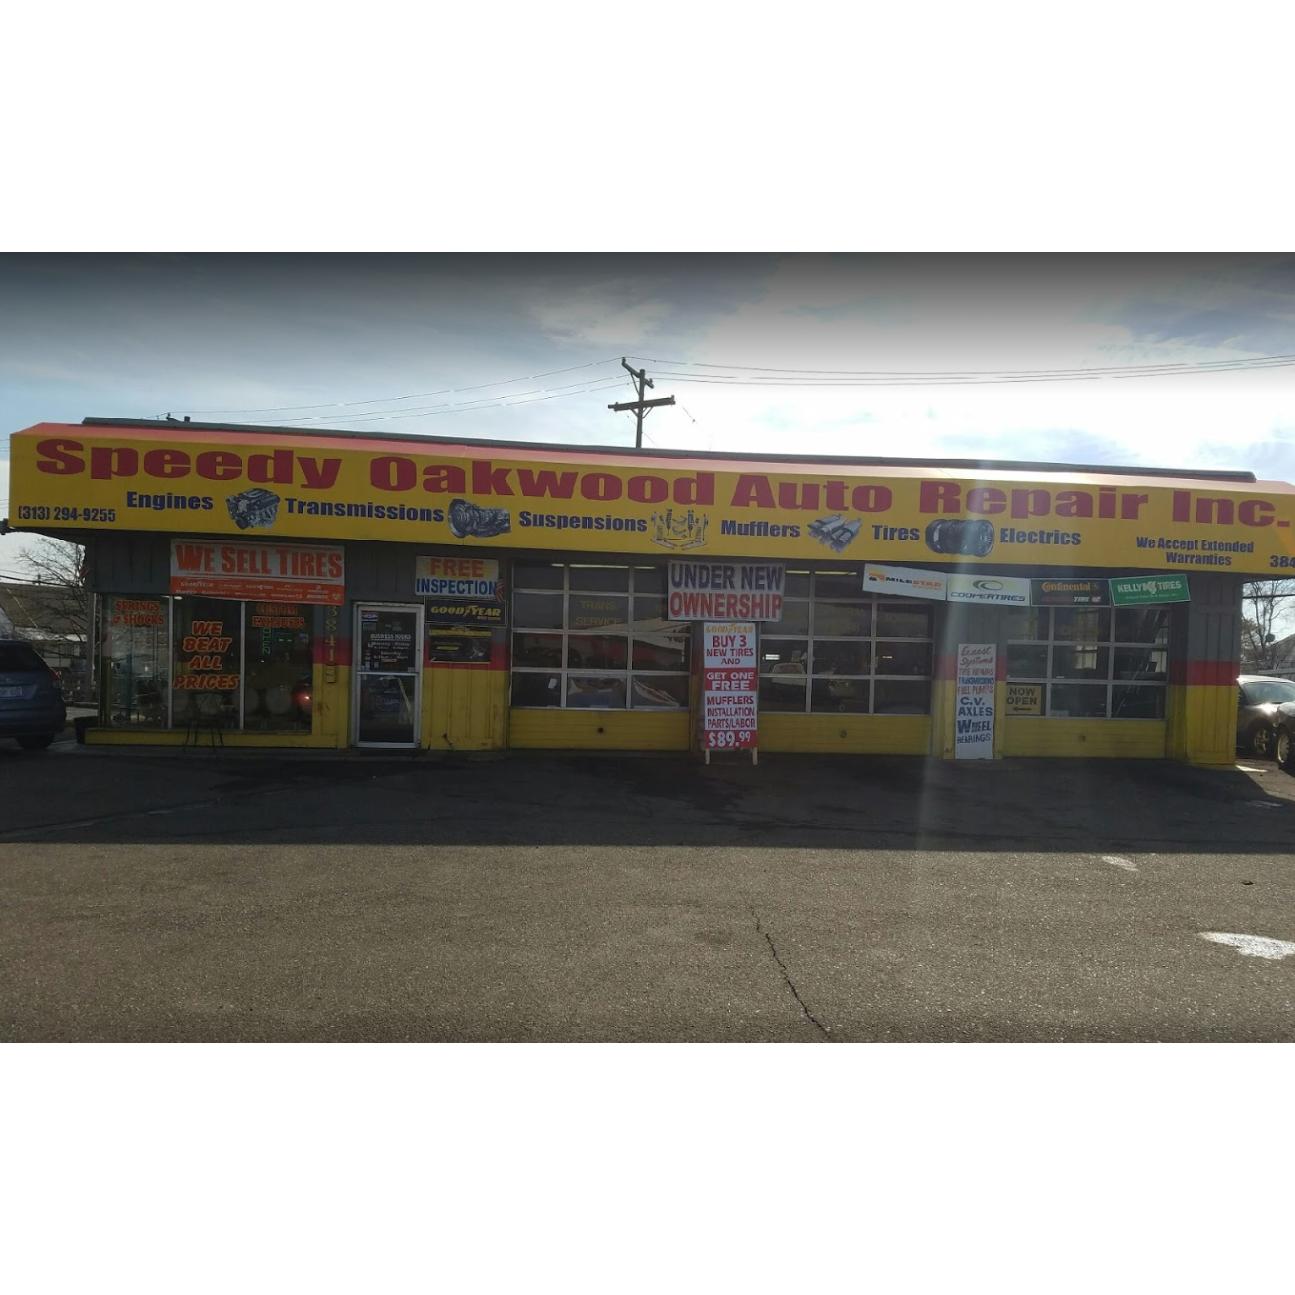 Speedy Oakwood Auto Repair Inc